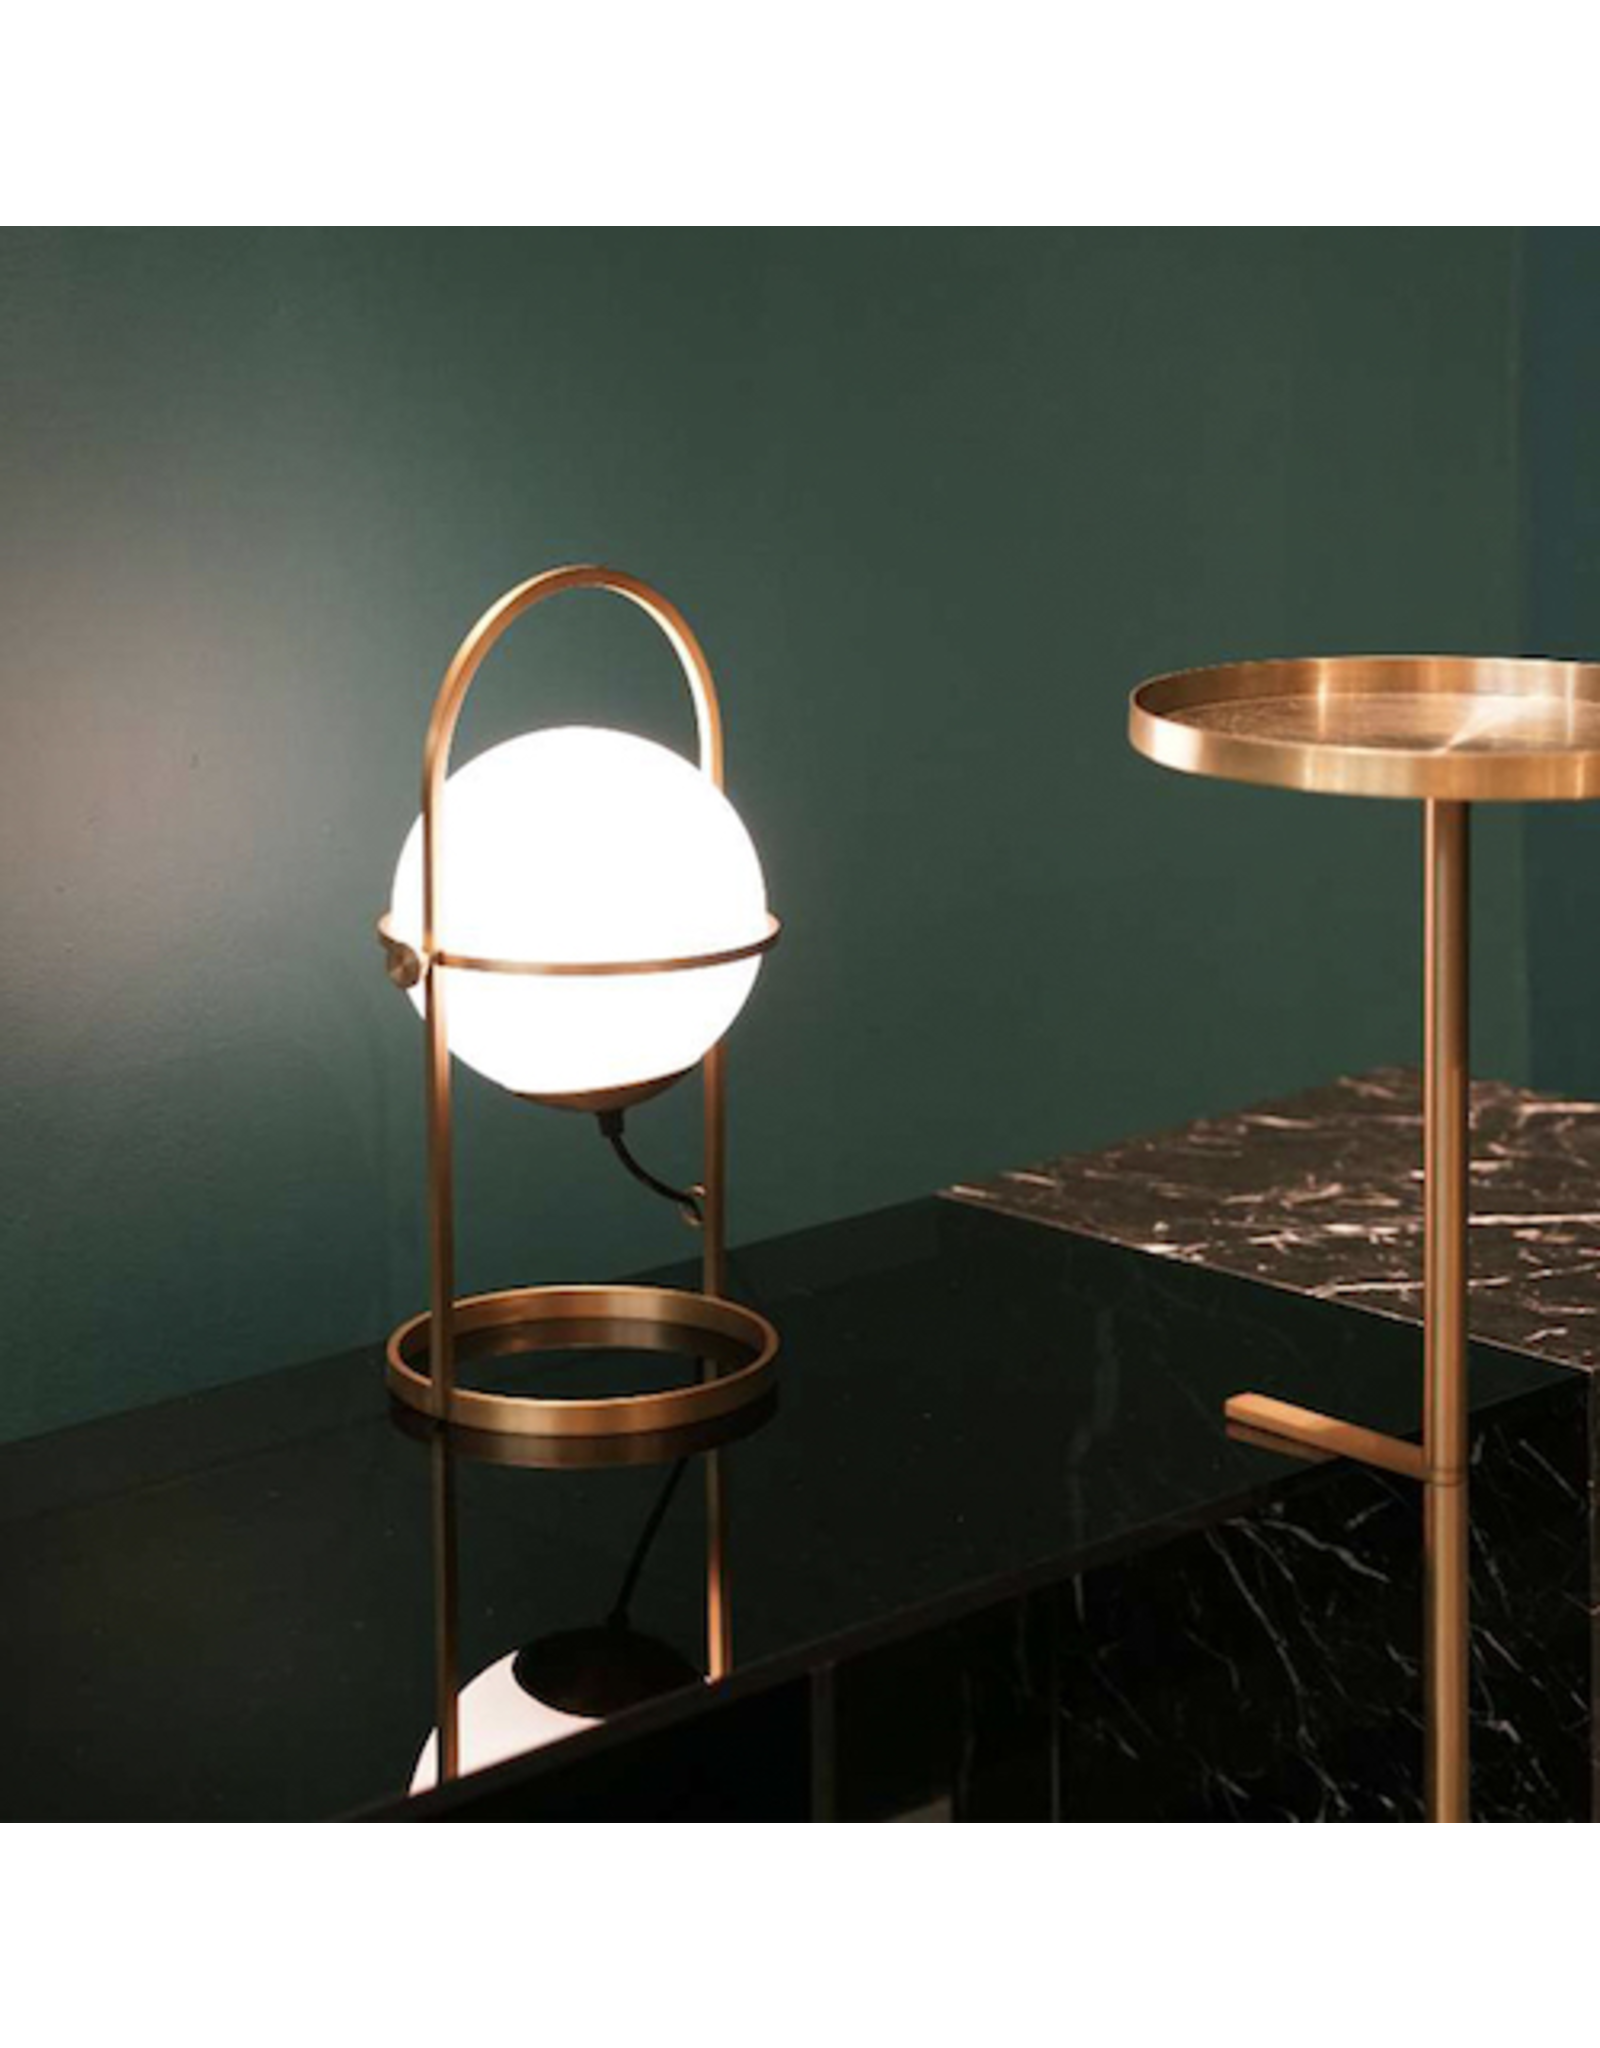 URBANCRAFT YUAN TABLE LAMP